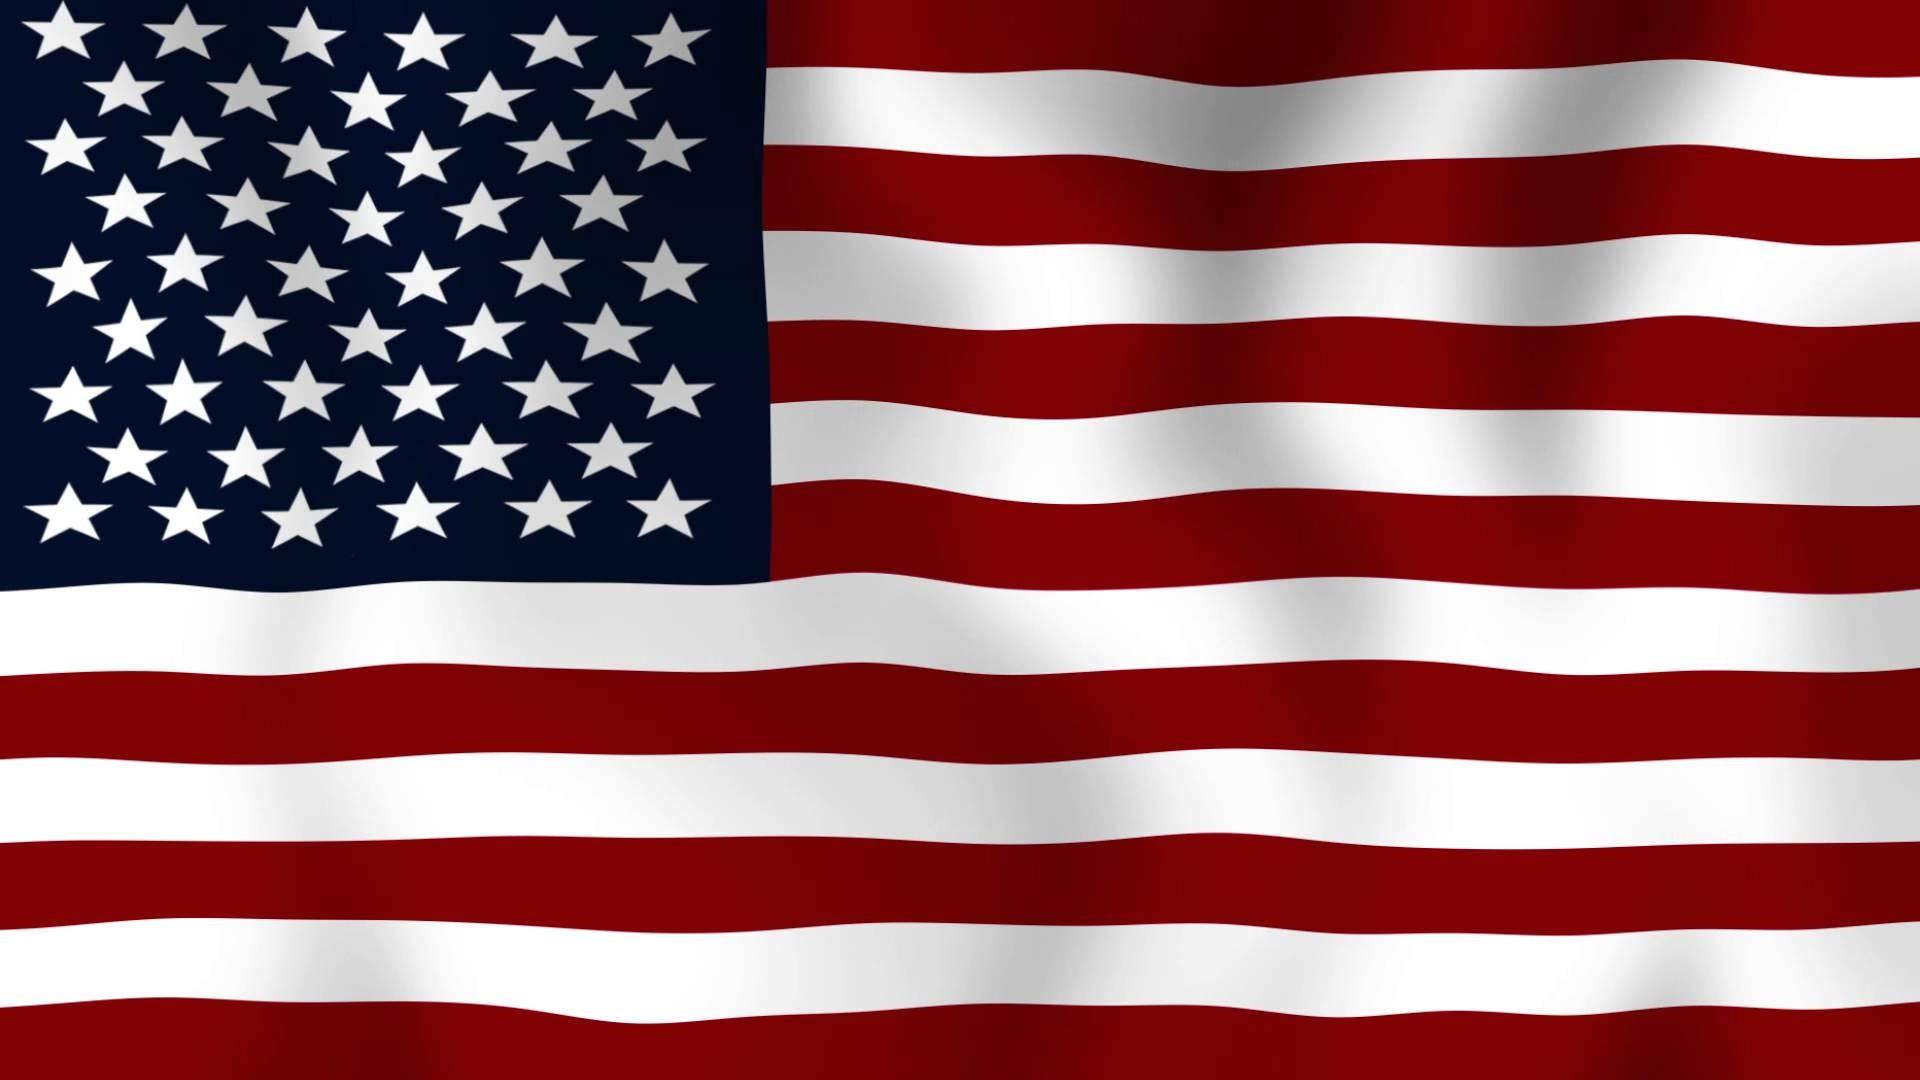 Patriotic Background 183 ① Download Free Beautiful Full Hd